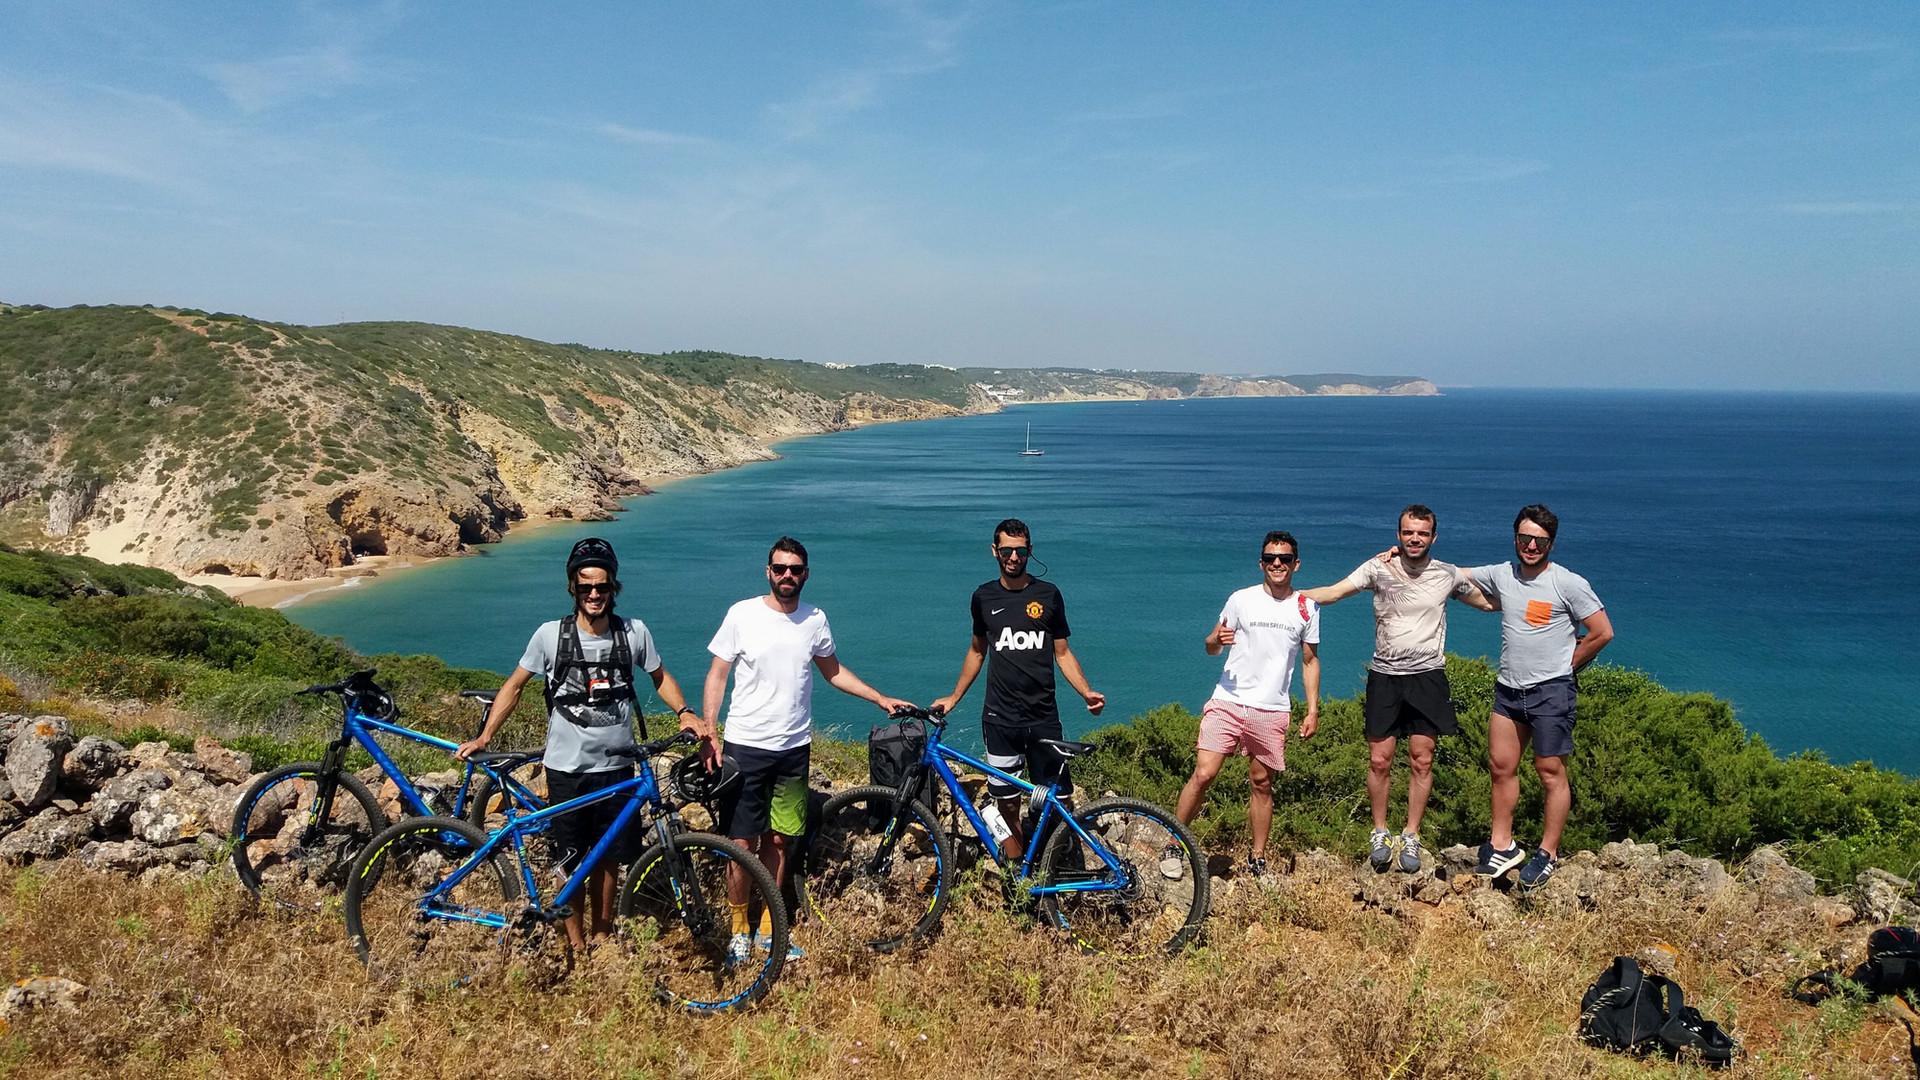 Western Algarve biking